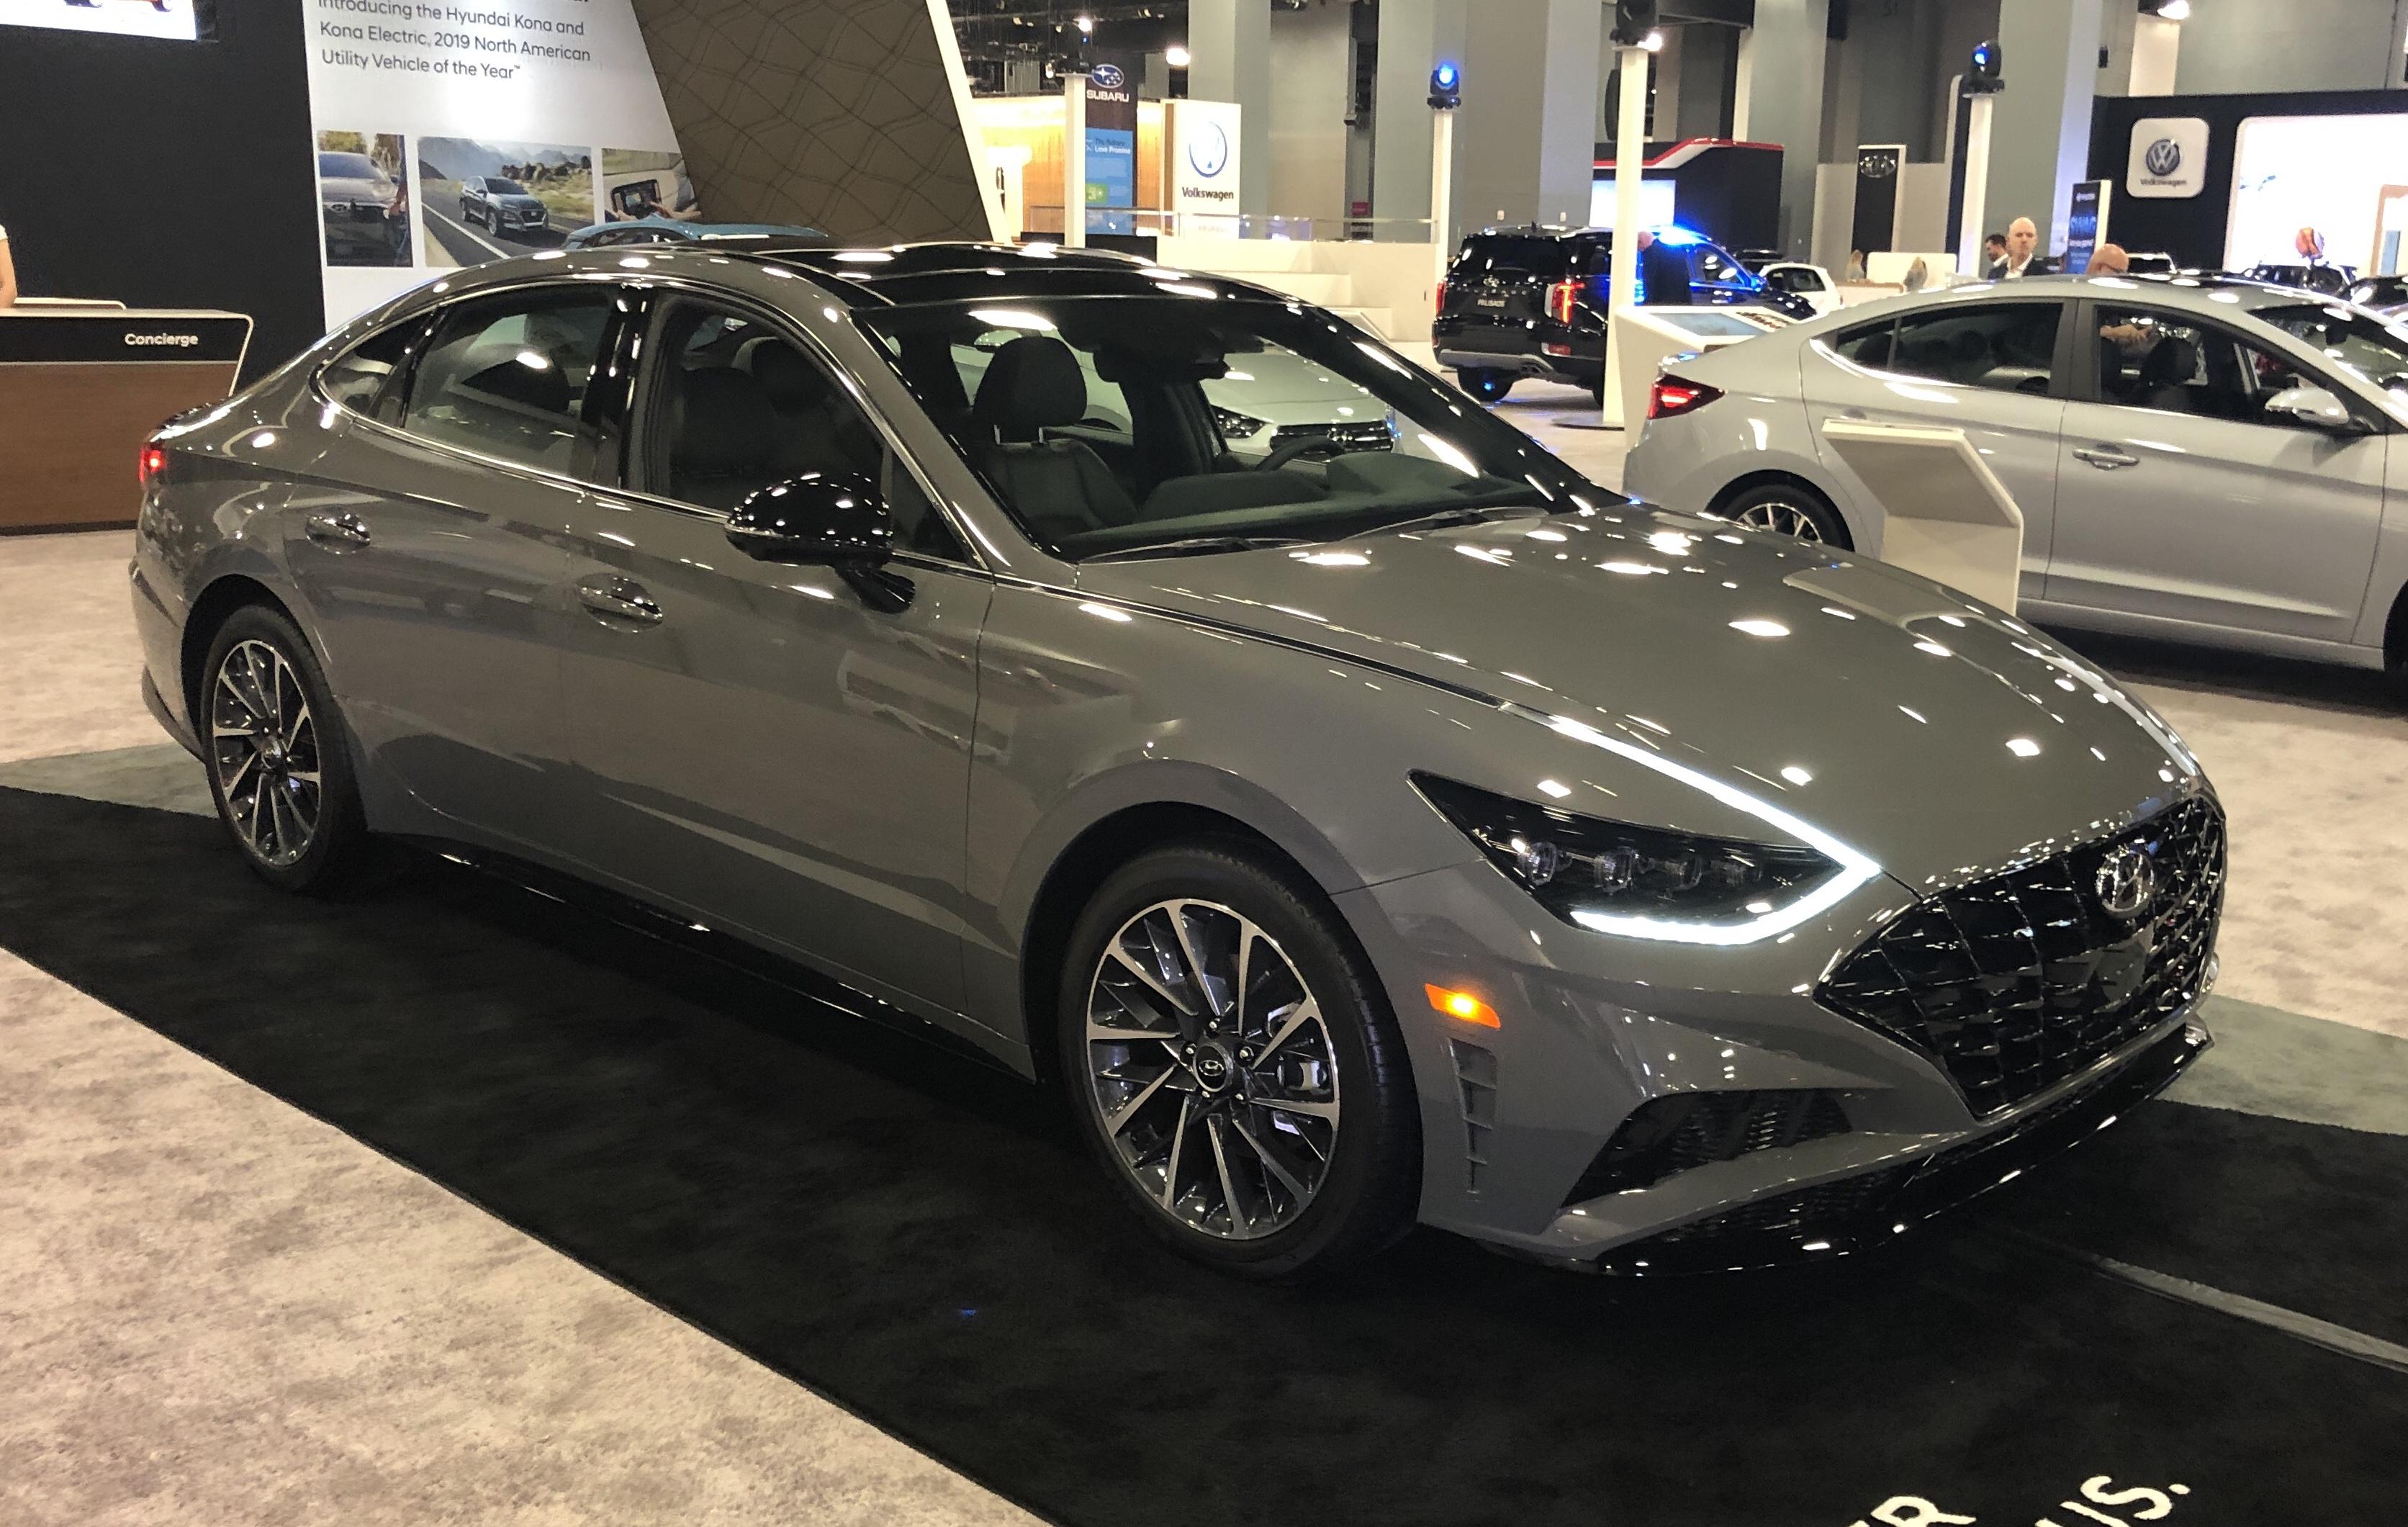 Miami Auto Show 2020.2020 Hyundai Sonata And Beyond 49th Annual Miami Auto Show